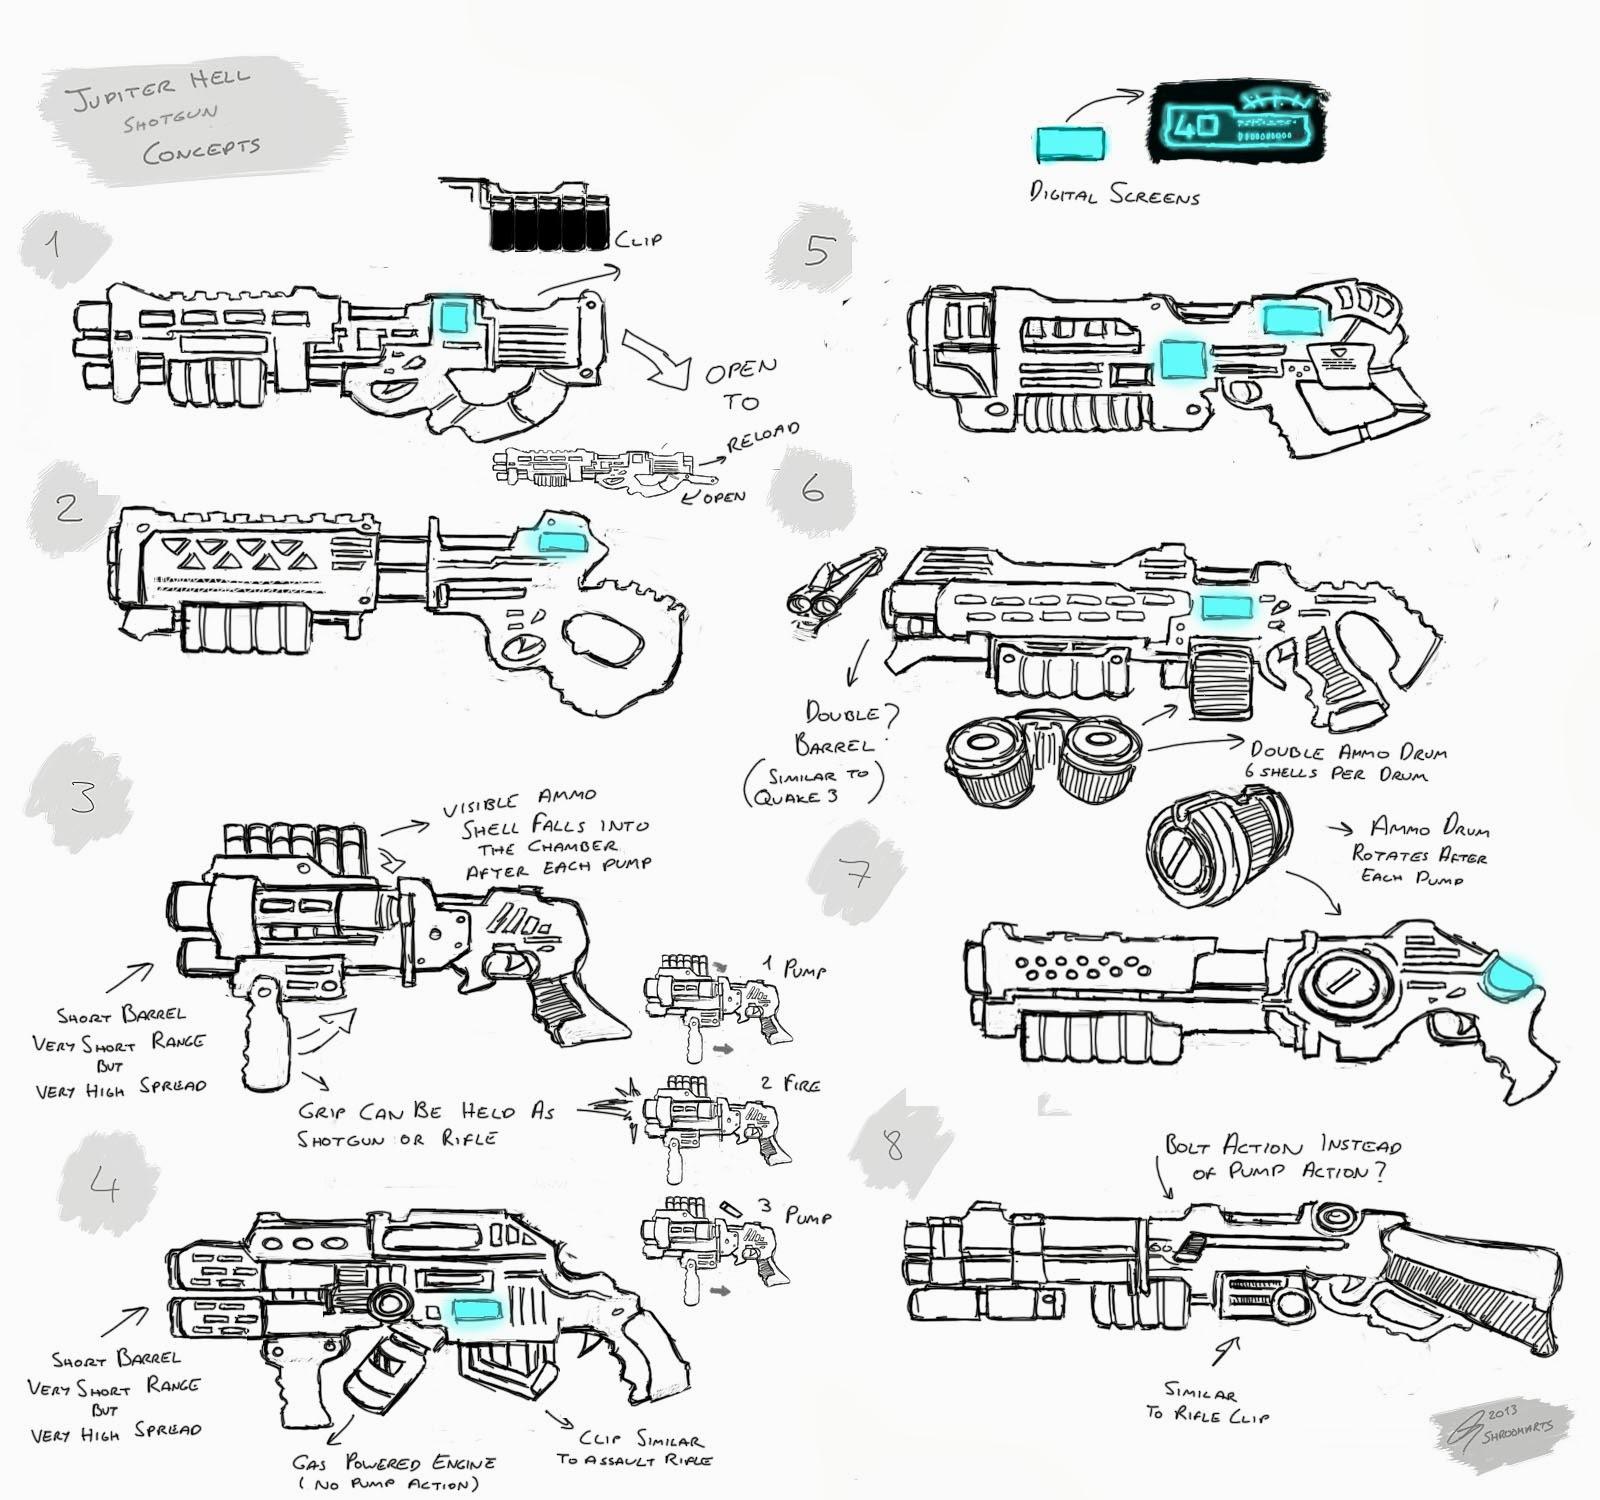 Shroomarts Jupiter Hell Pump Action Shotgun Diagram Concepts